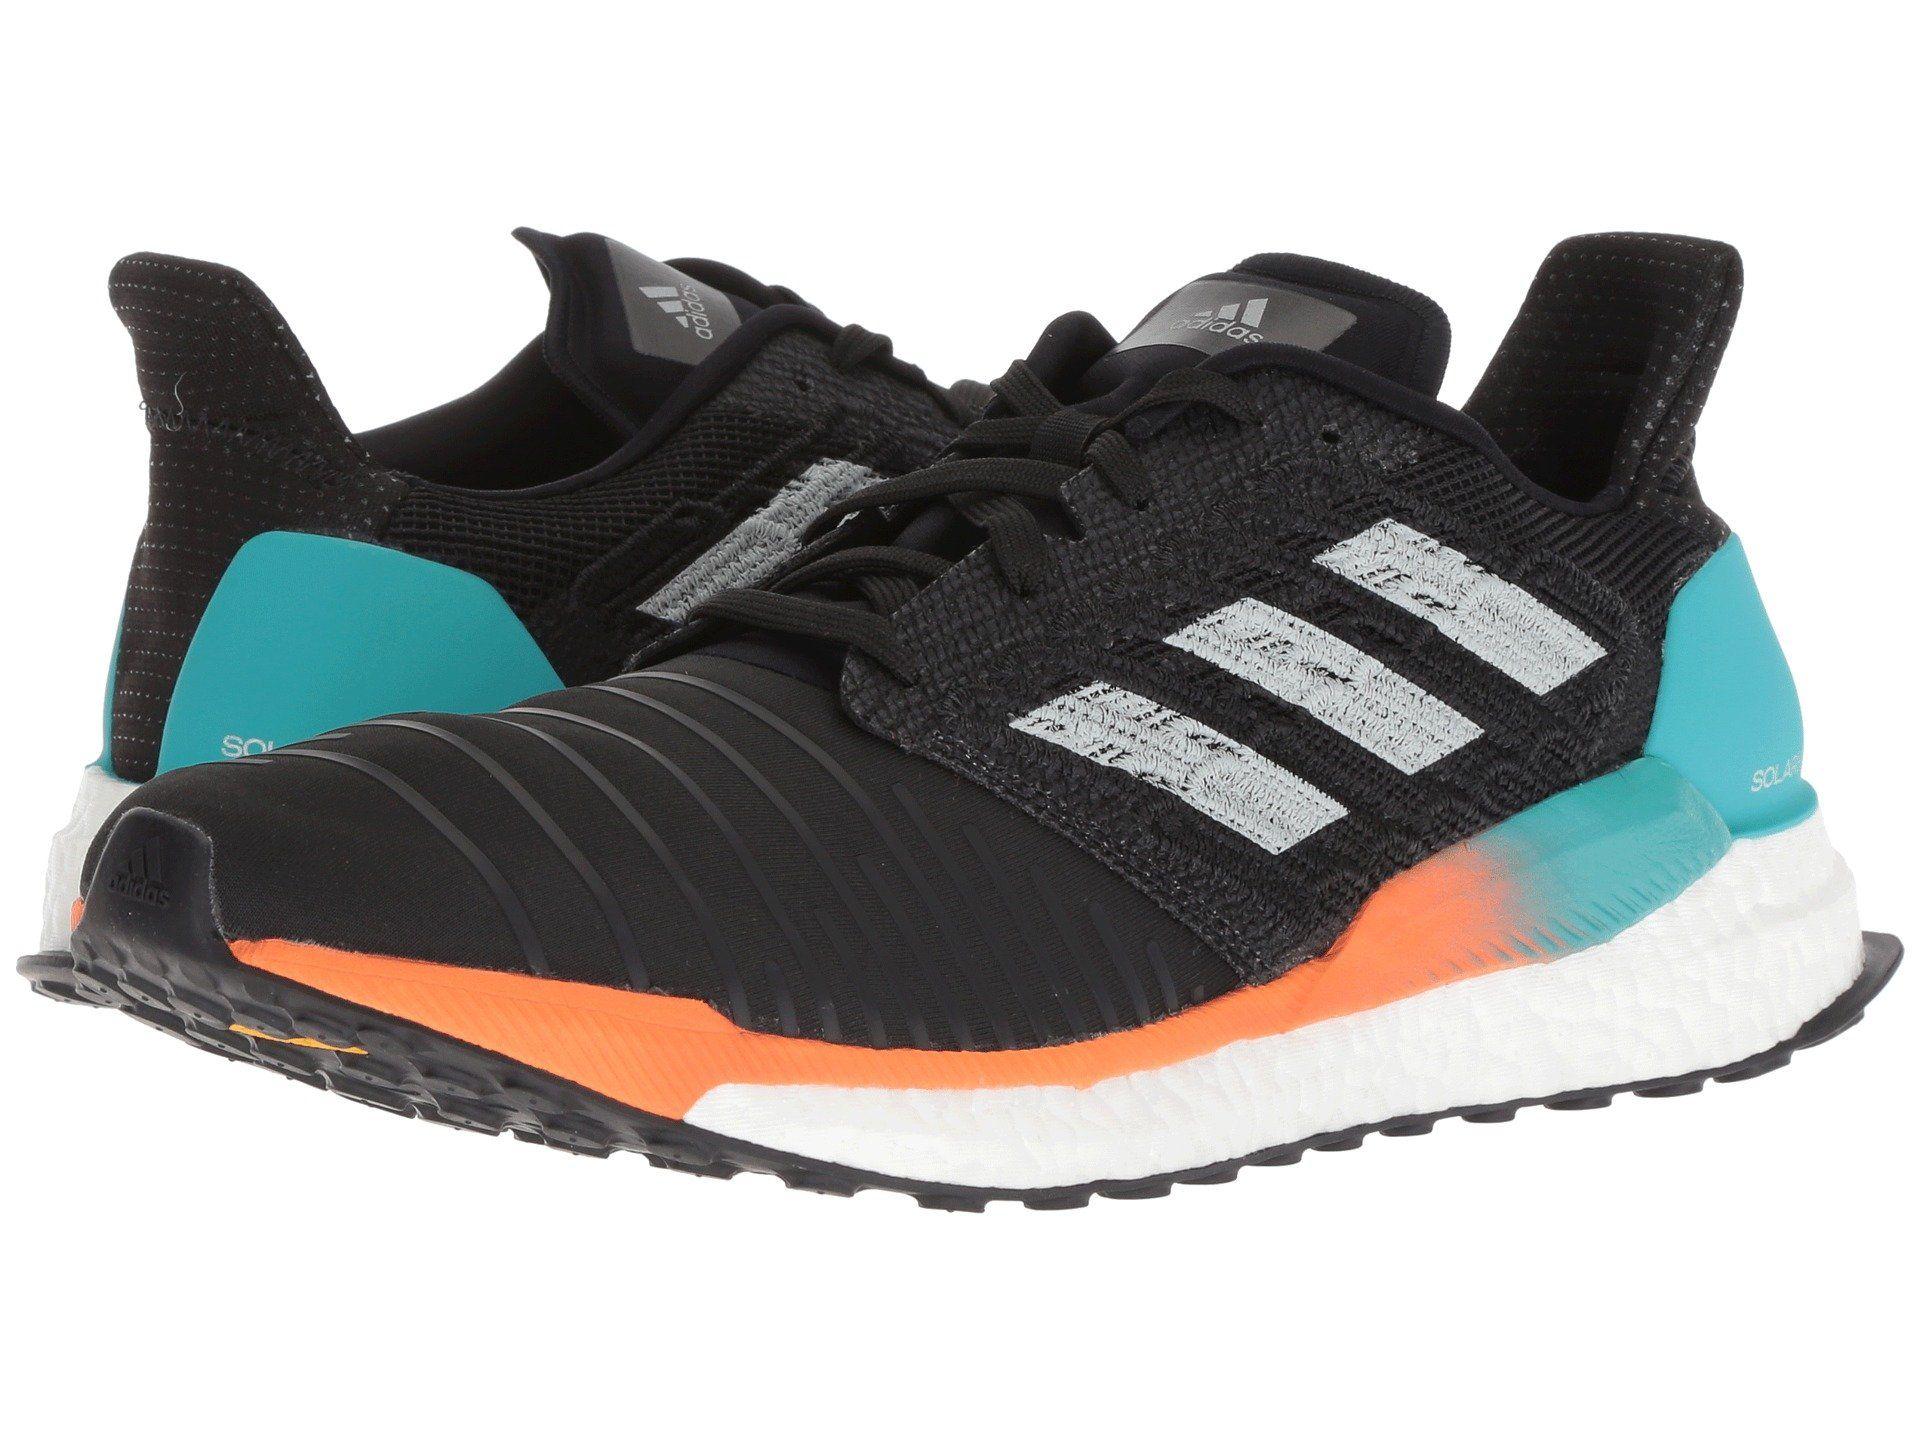 56be1bdf70c5 10 Best Running Shoes for Men 2018 - Best Running Sneakers